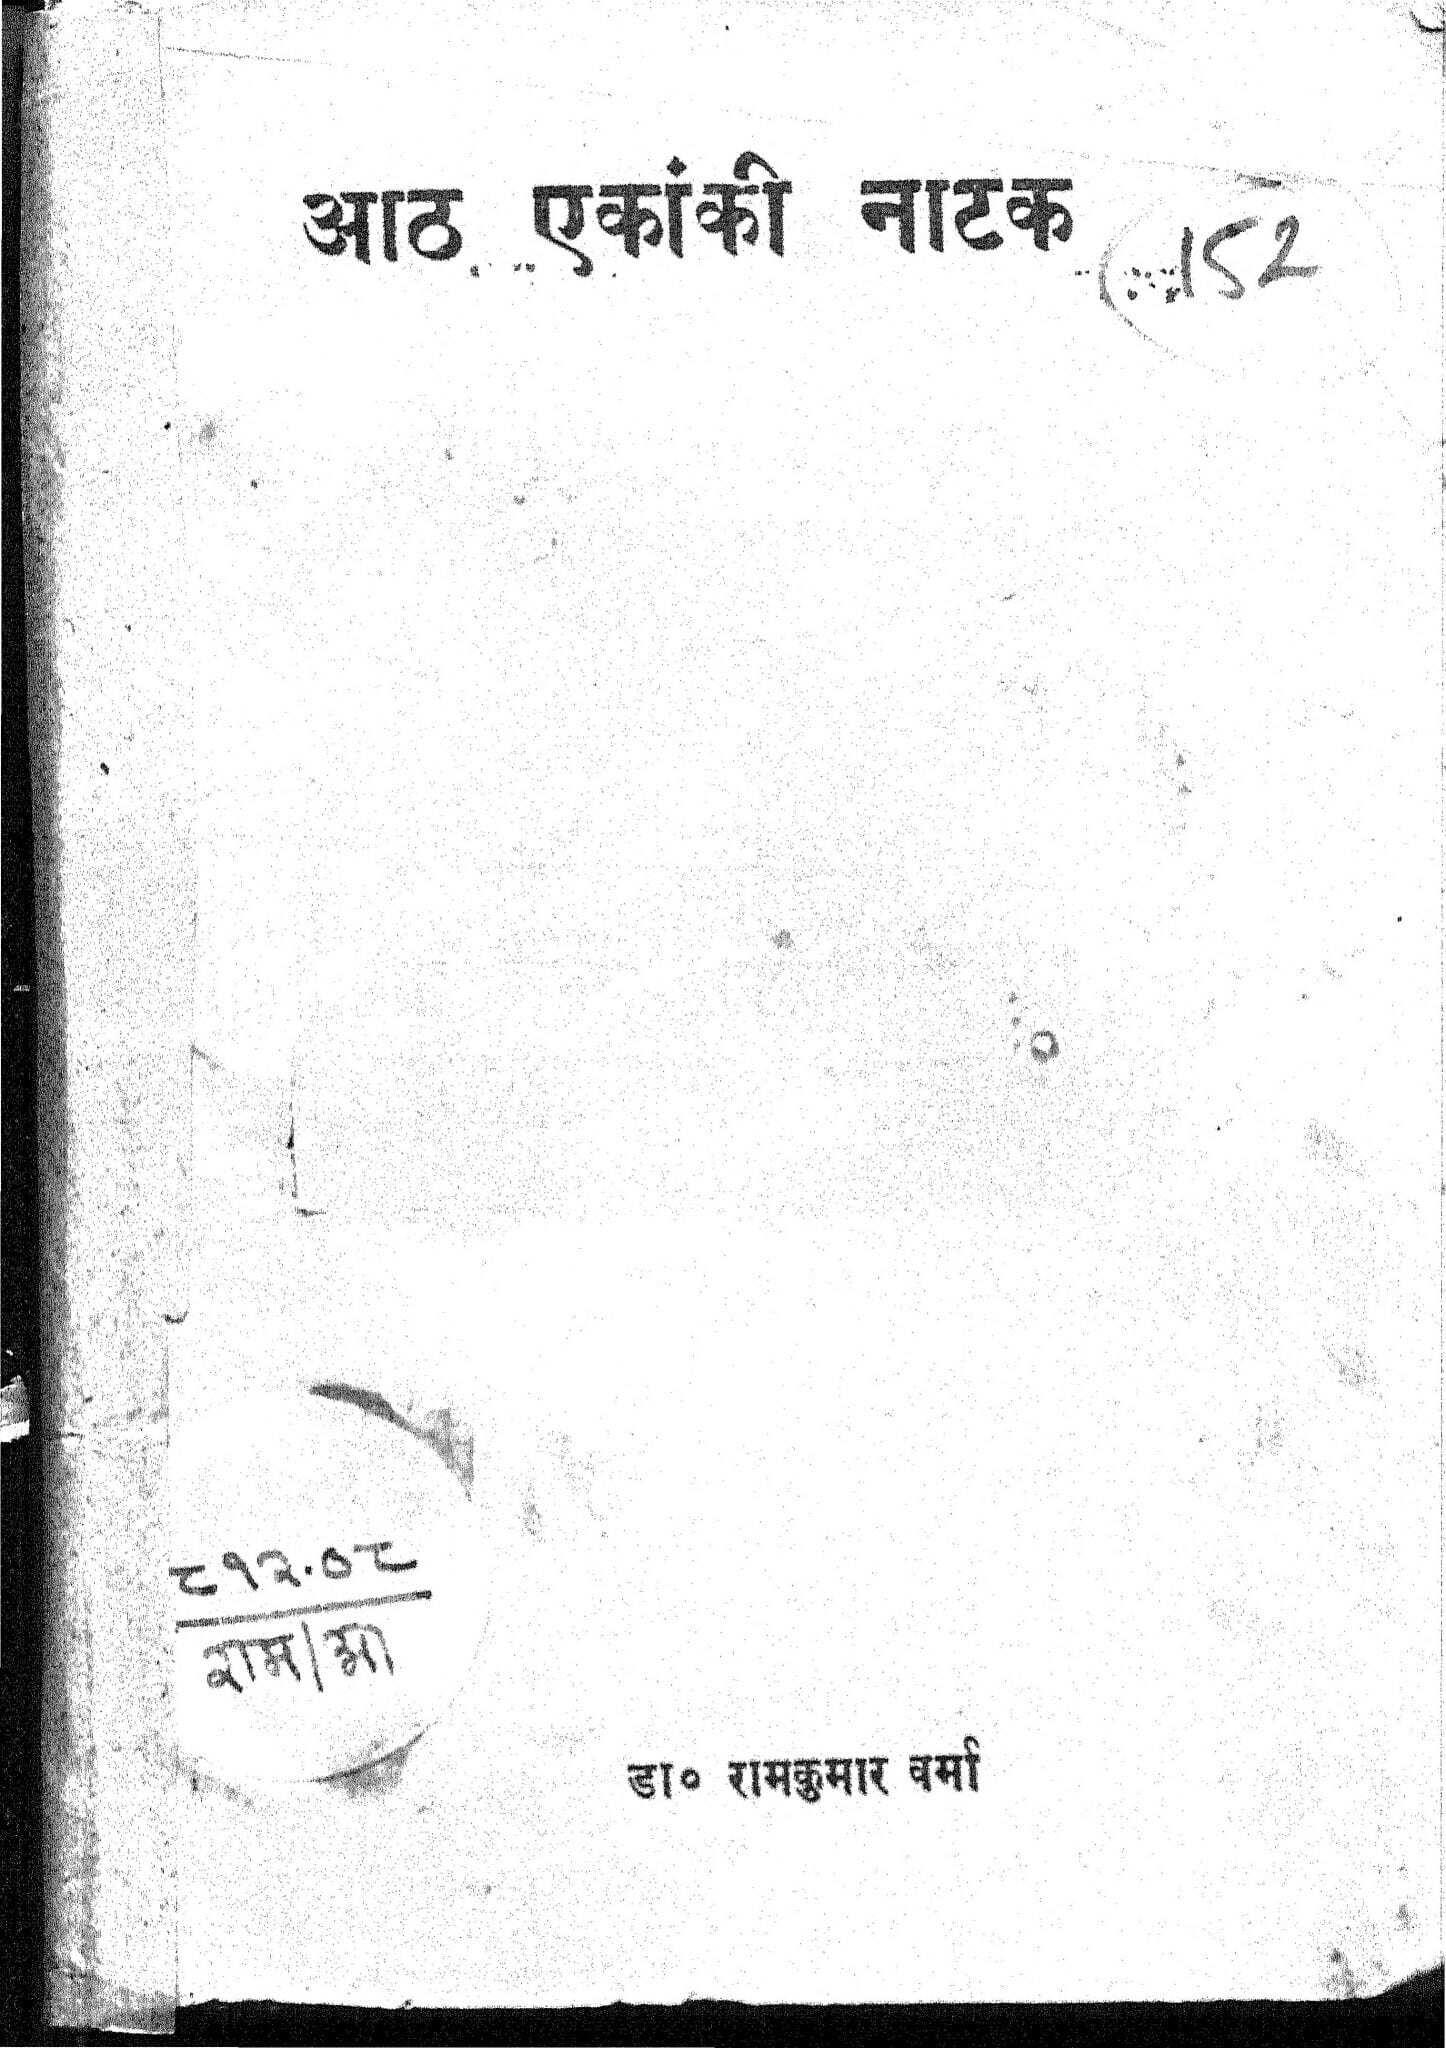 Aath Ekanki Natak by डॉ रामकुमार वर्मा - Dr. Ramkumar Varma